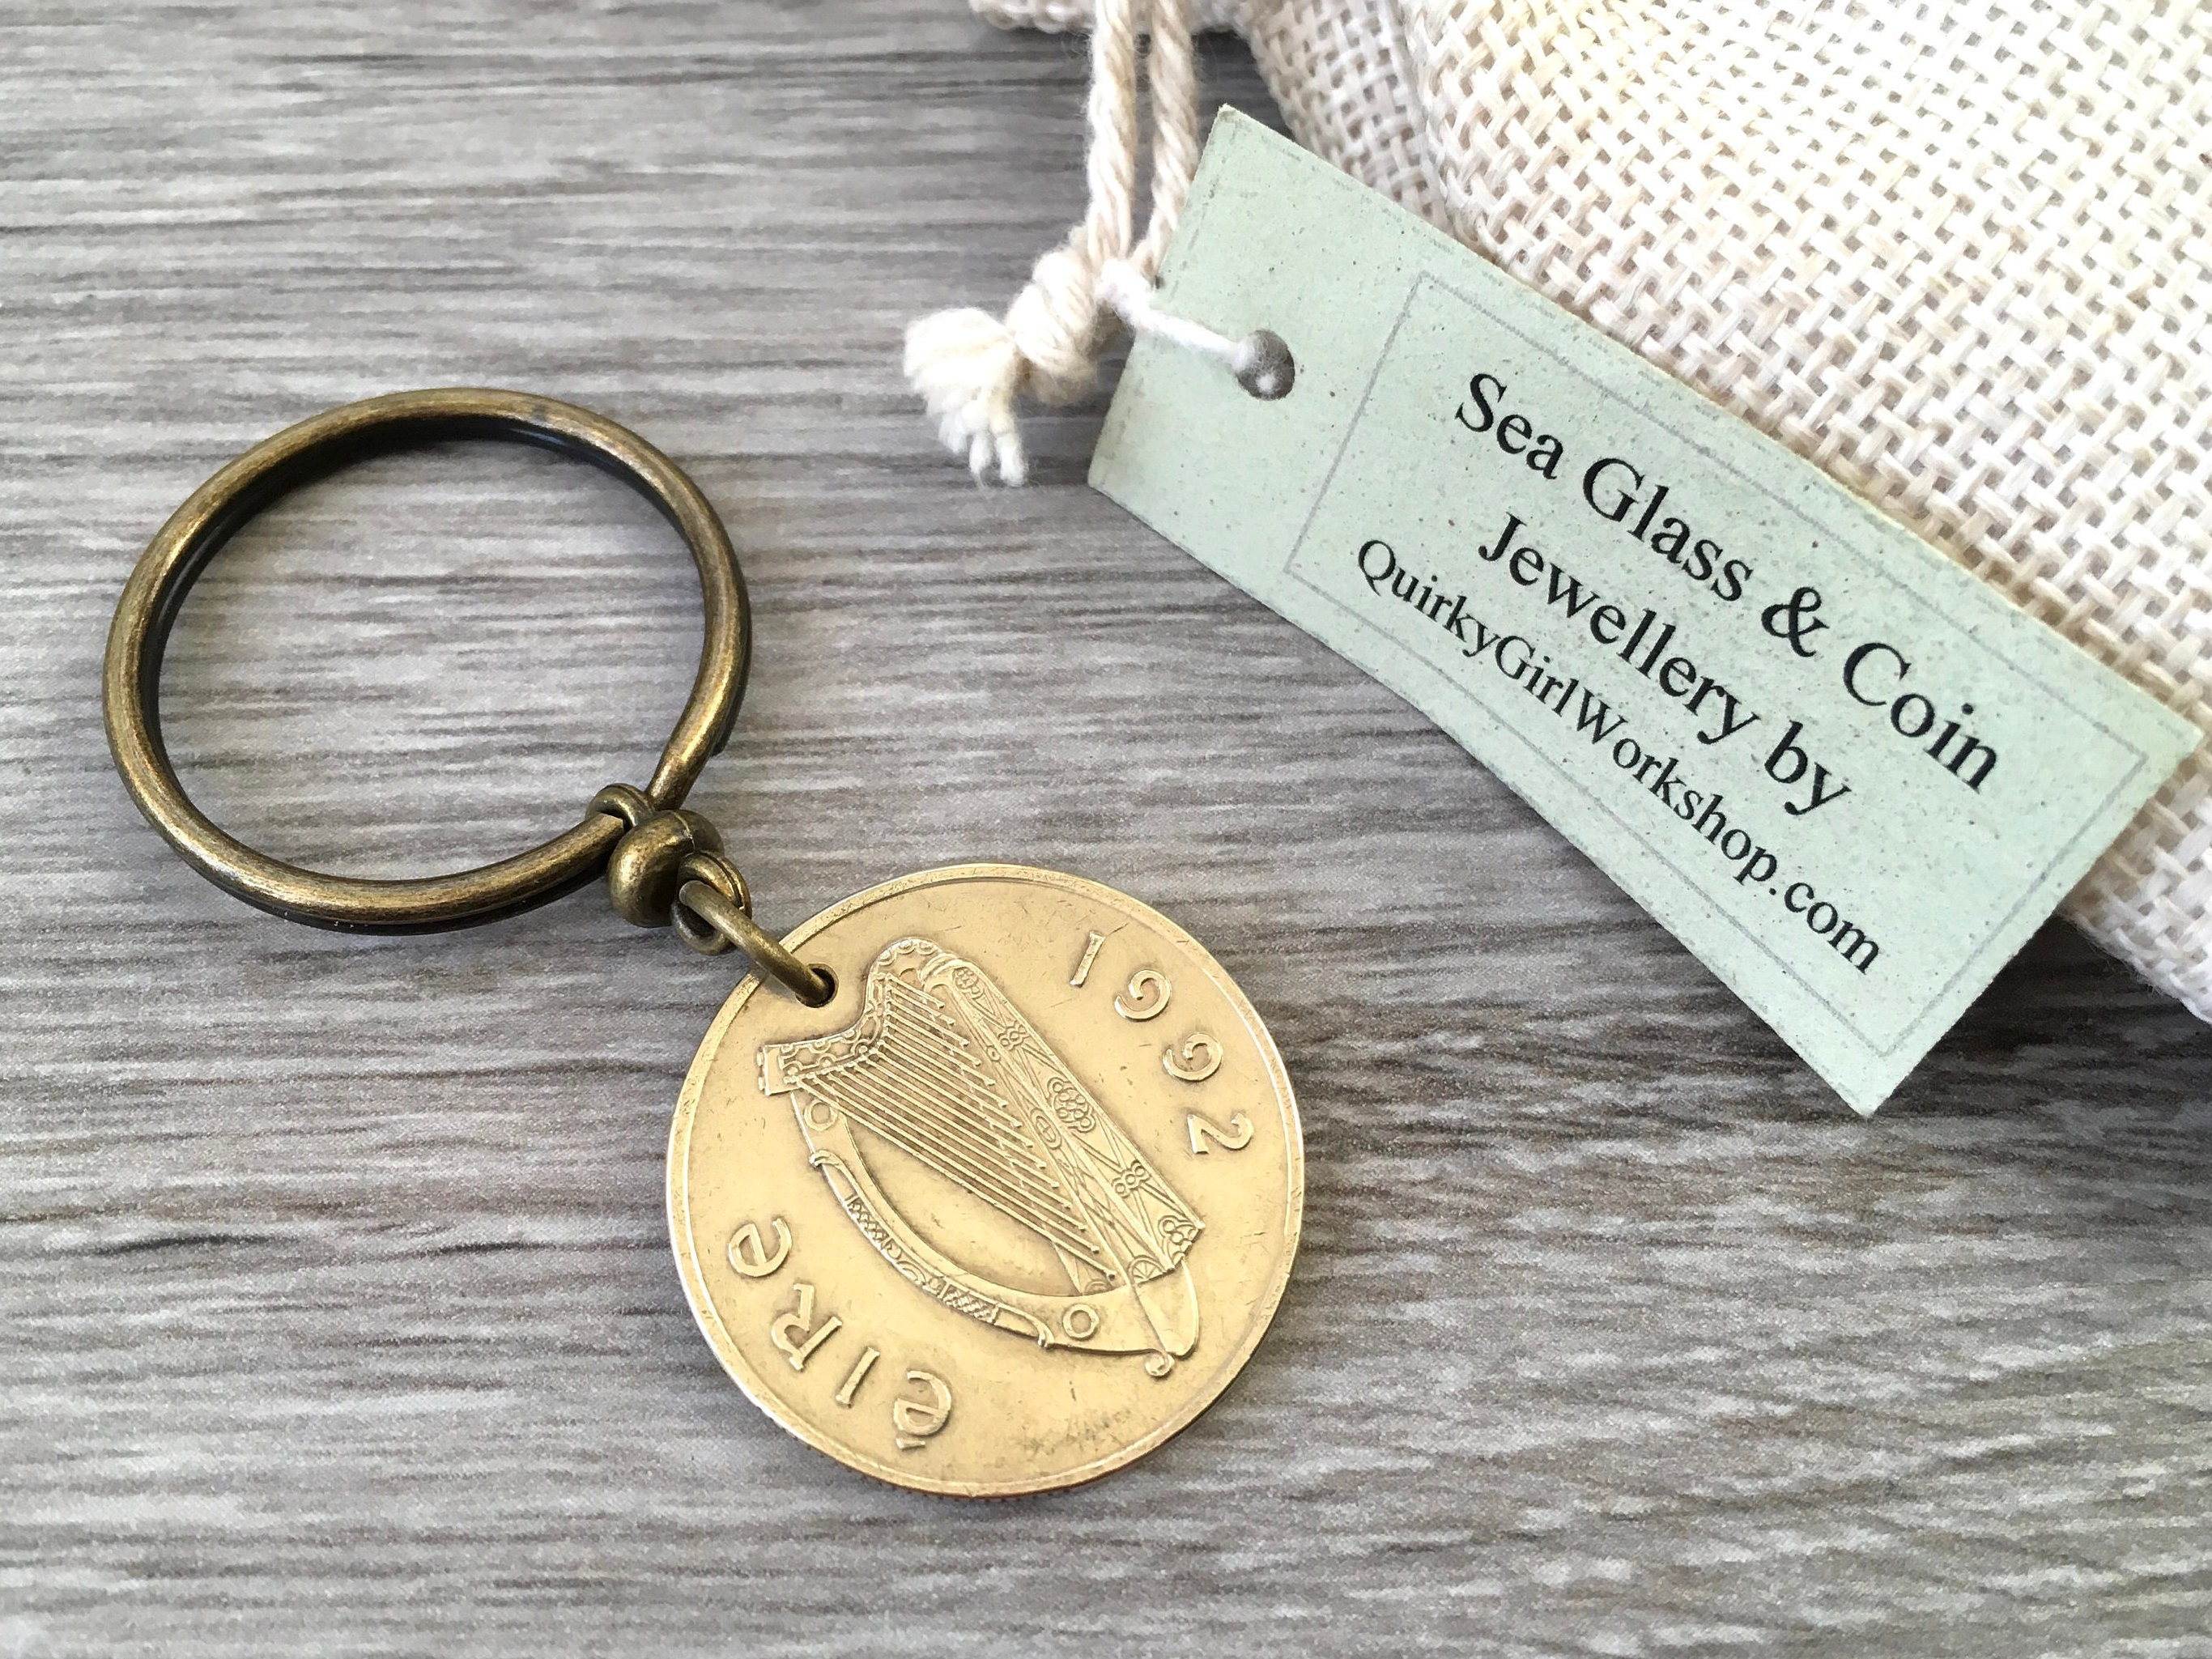 26th Wedding Anniversary Gift: 1992 Or 1994 Irish Coin Keyring, Ireland Keychain, 24th Or